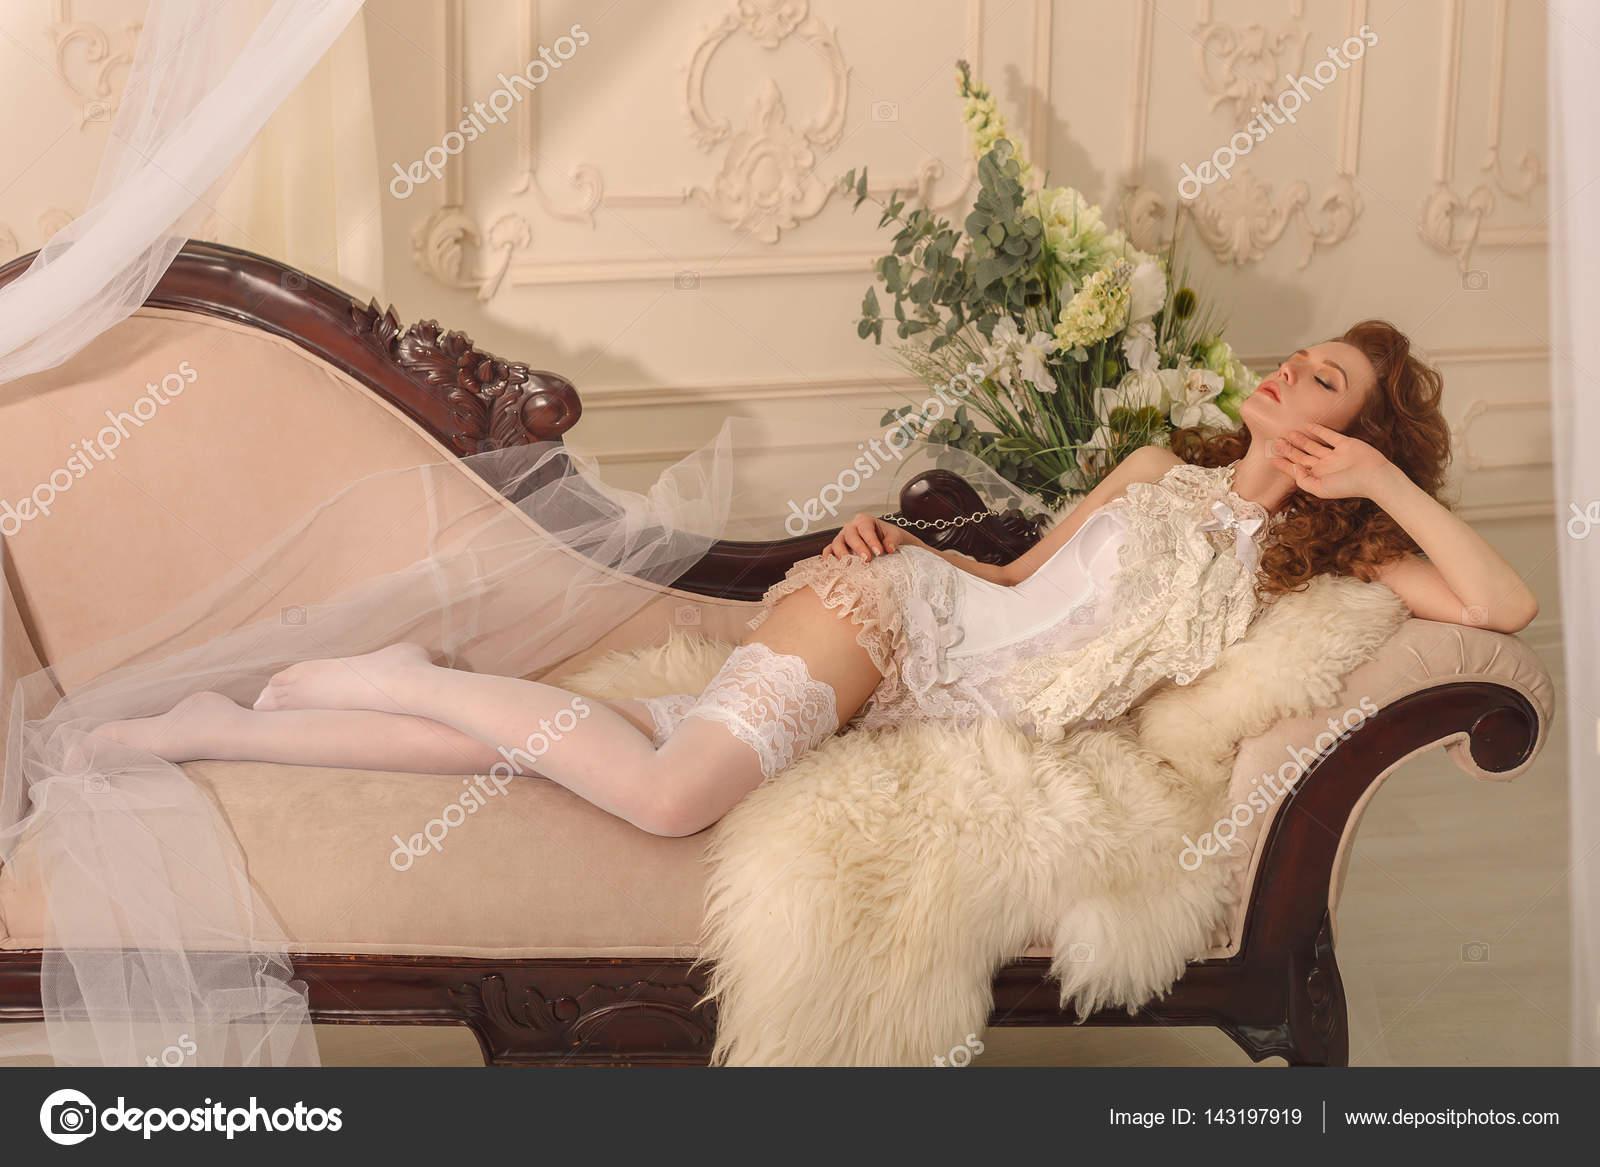 pervokursnikov-obshage-foto-erotika-barokko-rossi